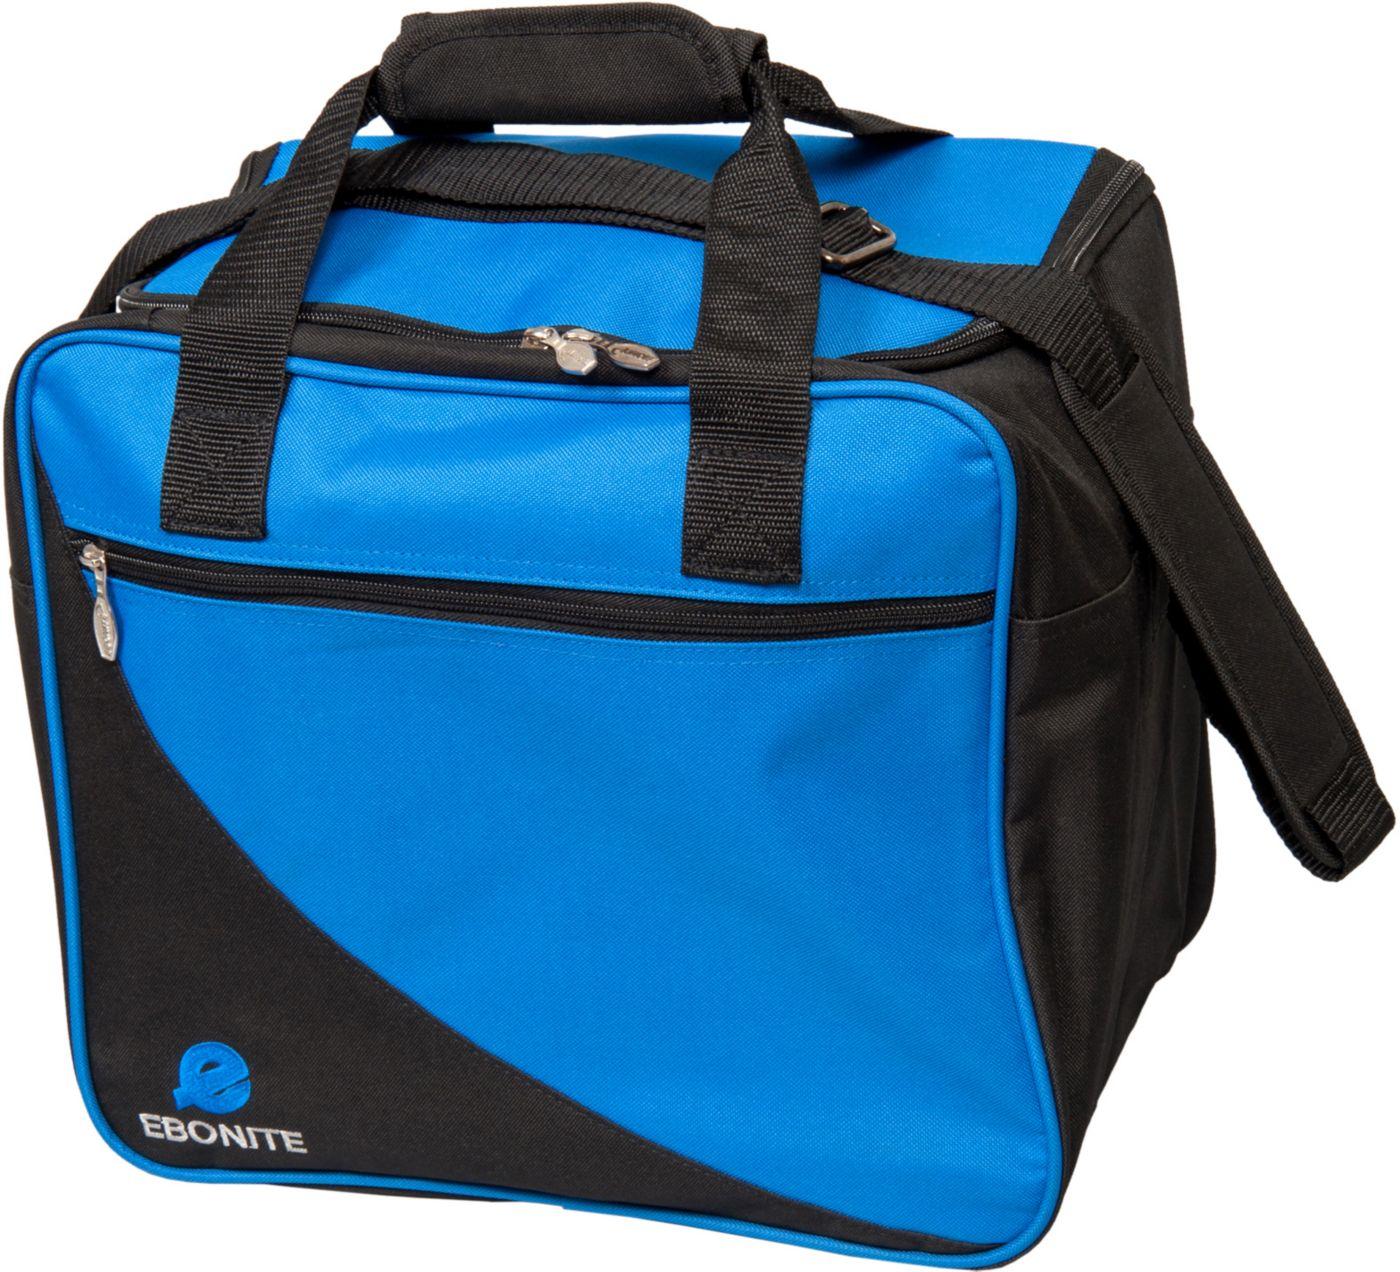 Ebonite Basic 1-Ball Shoulder Bowling Bag